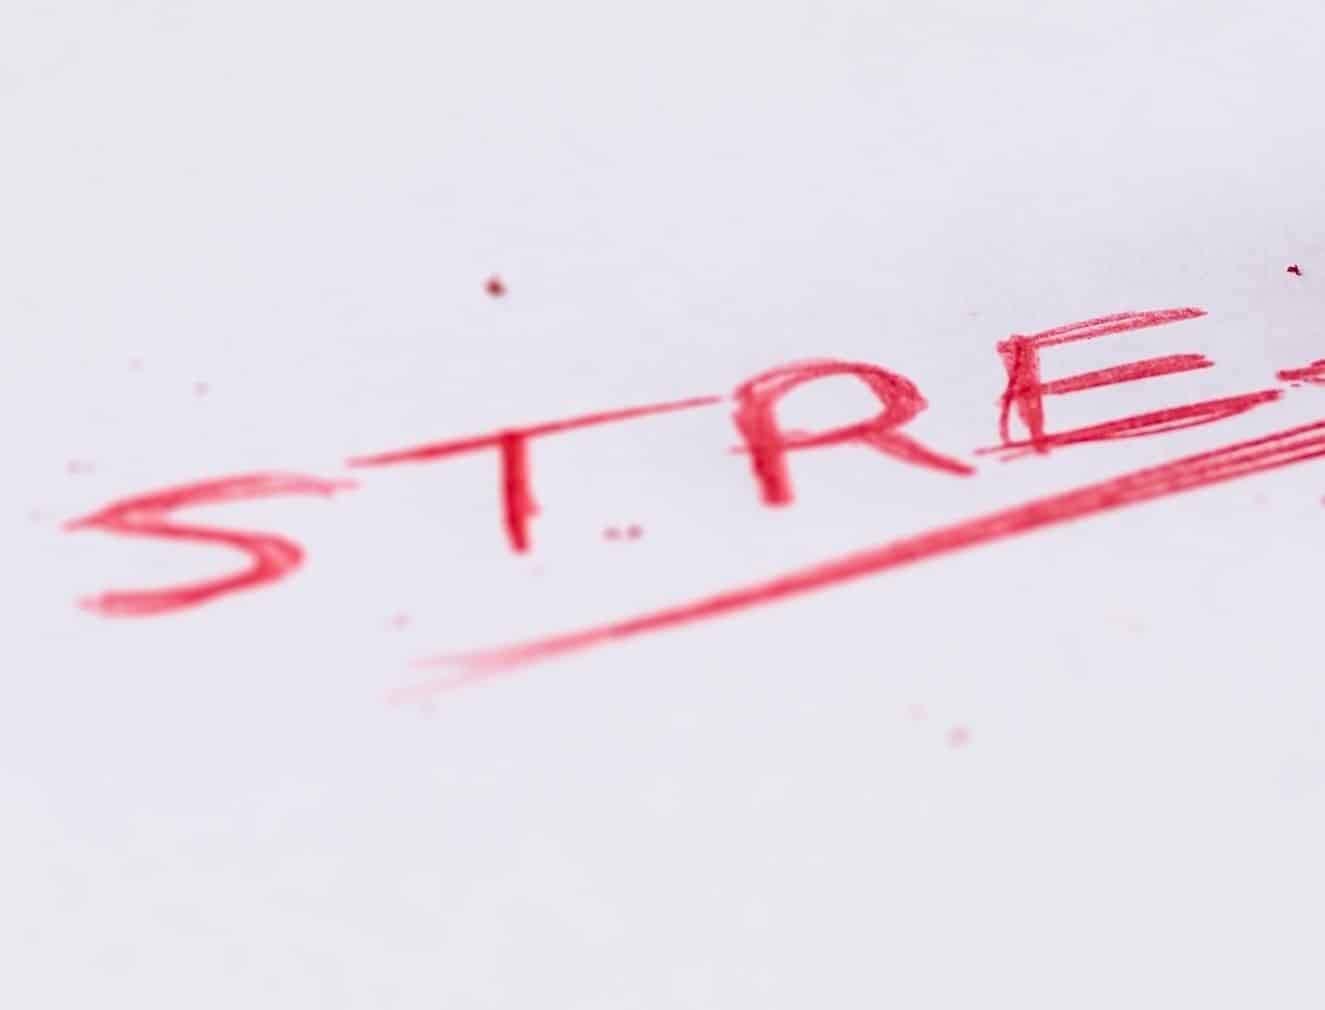 Hulp bij overspannenheid Soest en omstreken